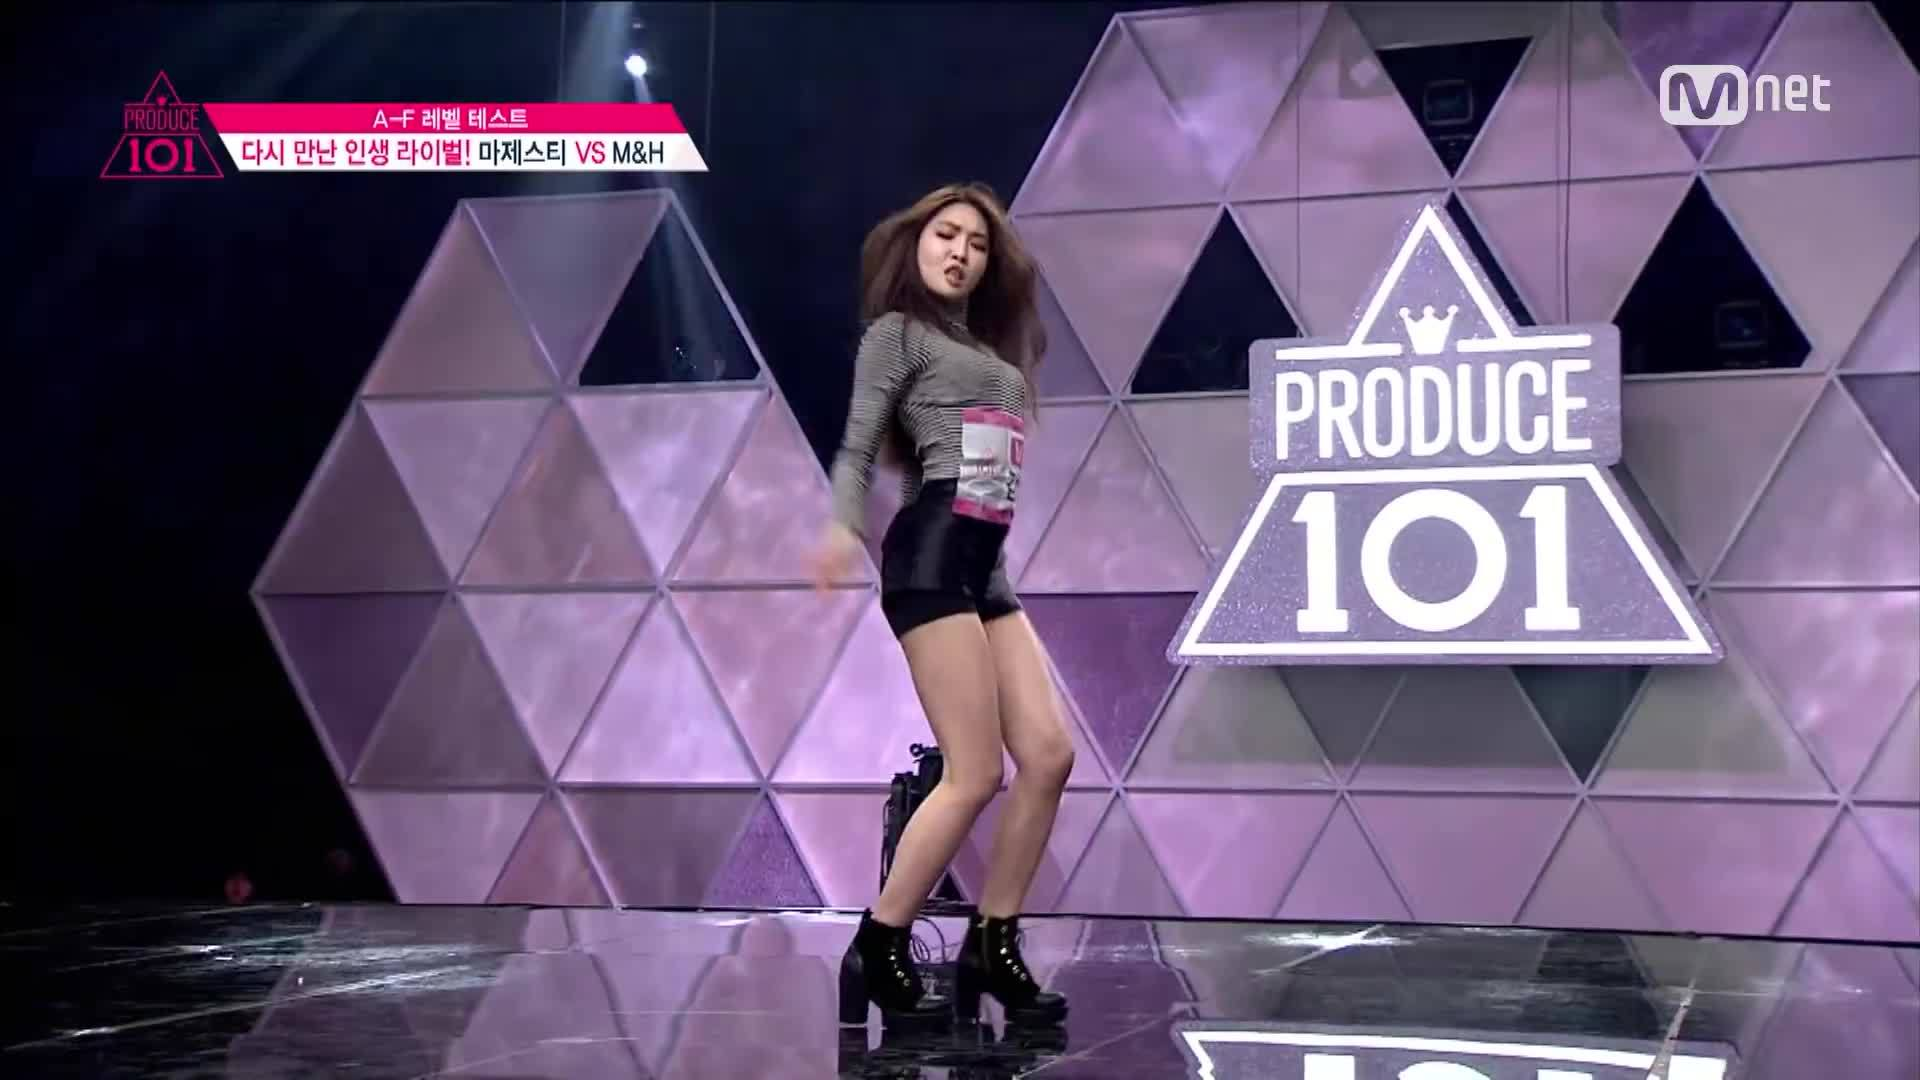 produce101, 오프닝, 프로듀스101, Produce 101 [2회] 노래면 노래 춤이면 춤! M&H 오서정,김청하 - ♬24시간이 모자라 160129 EP.2 GIFs